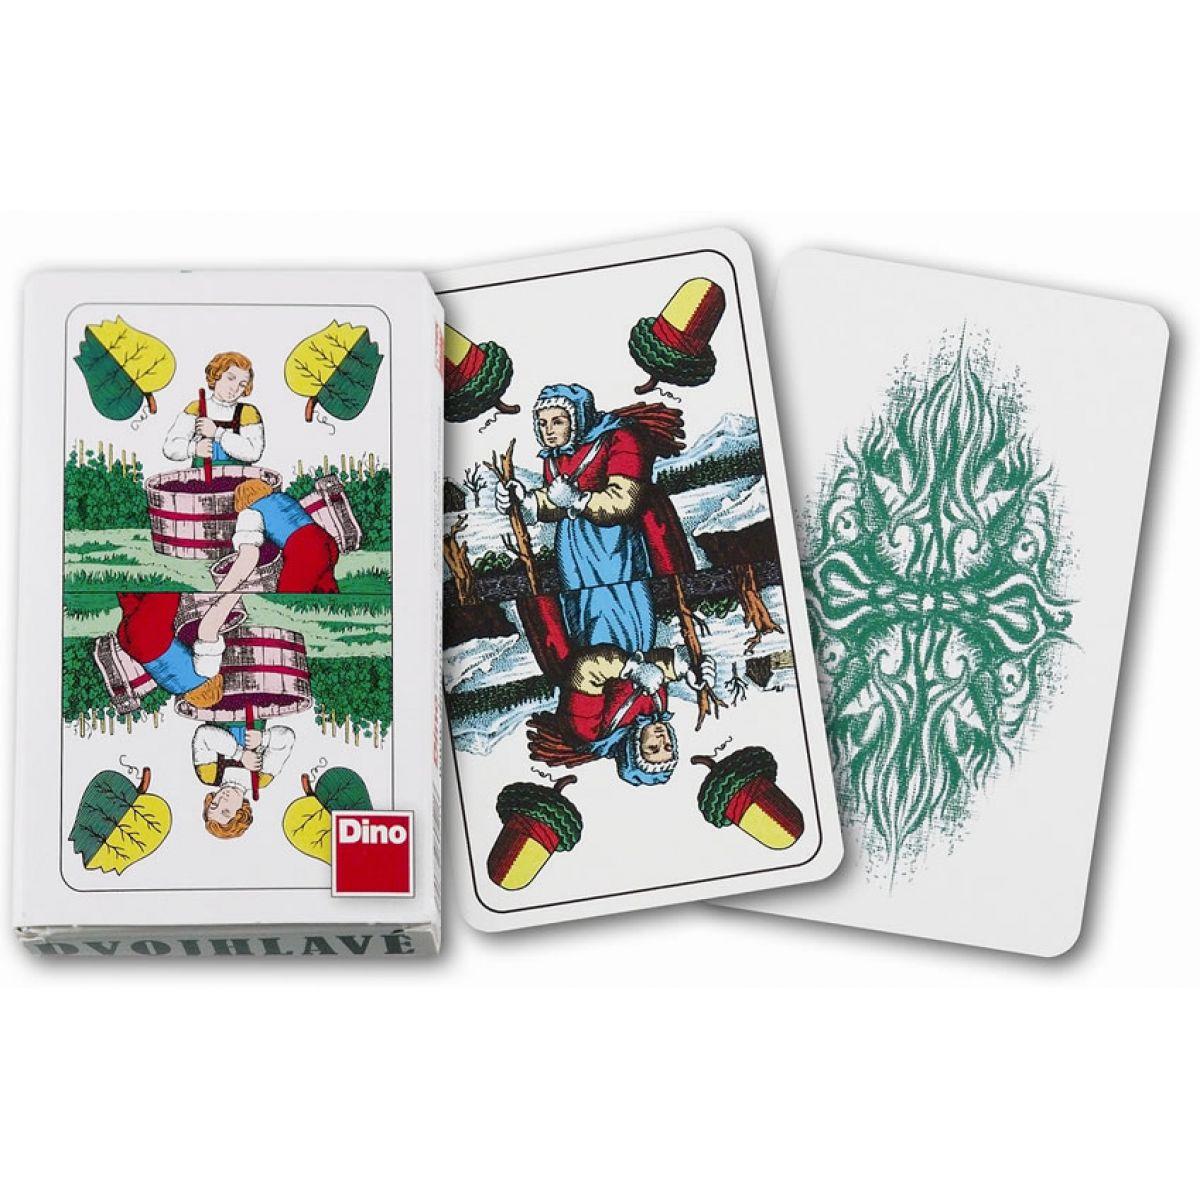 Dino Karty hrací dvouhlavé